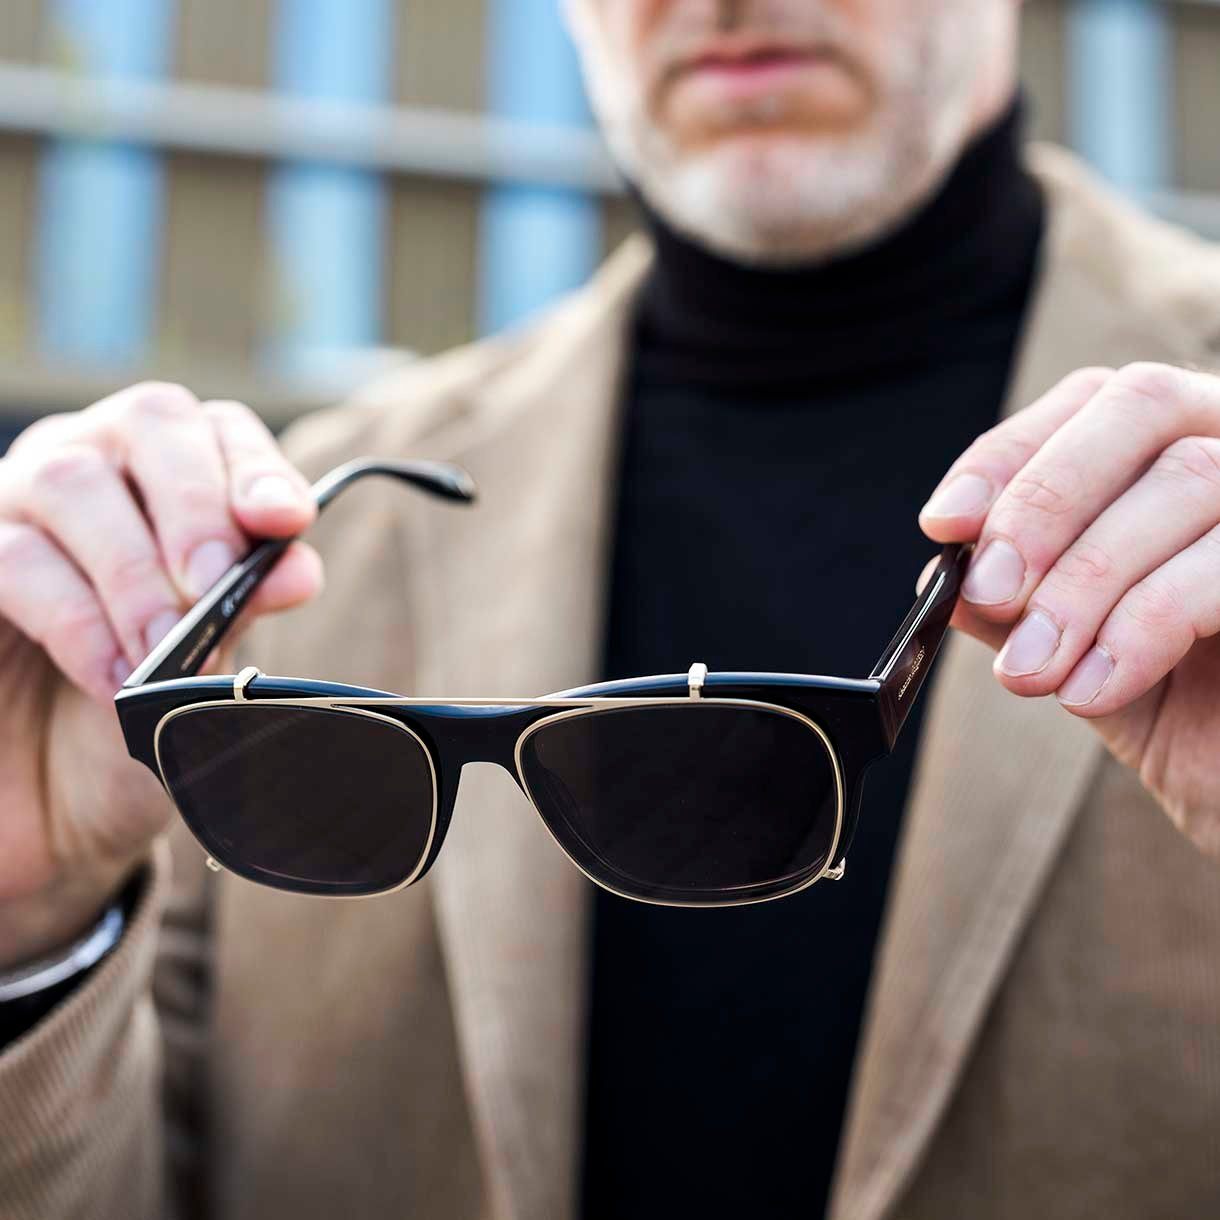 AM0262S-001-54 Alexander Mcqueen zonnebril